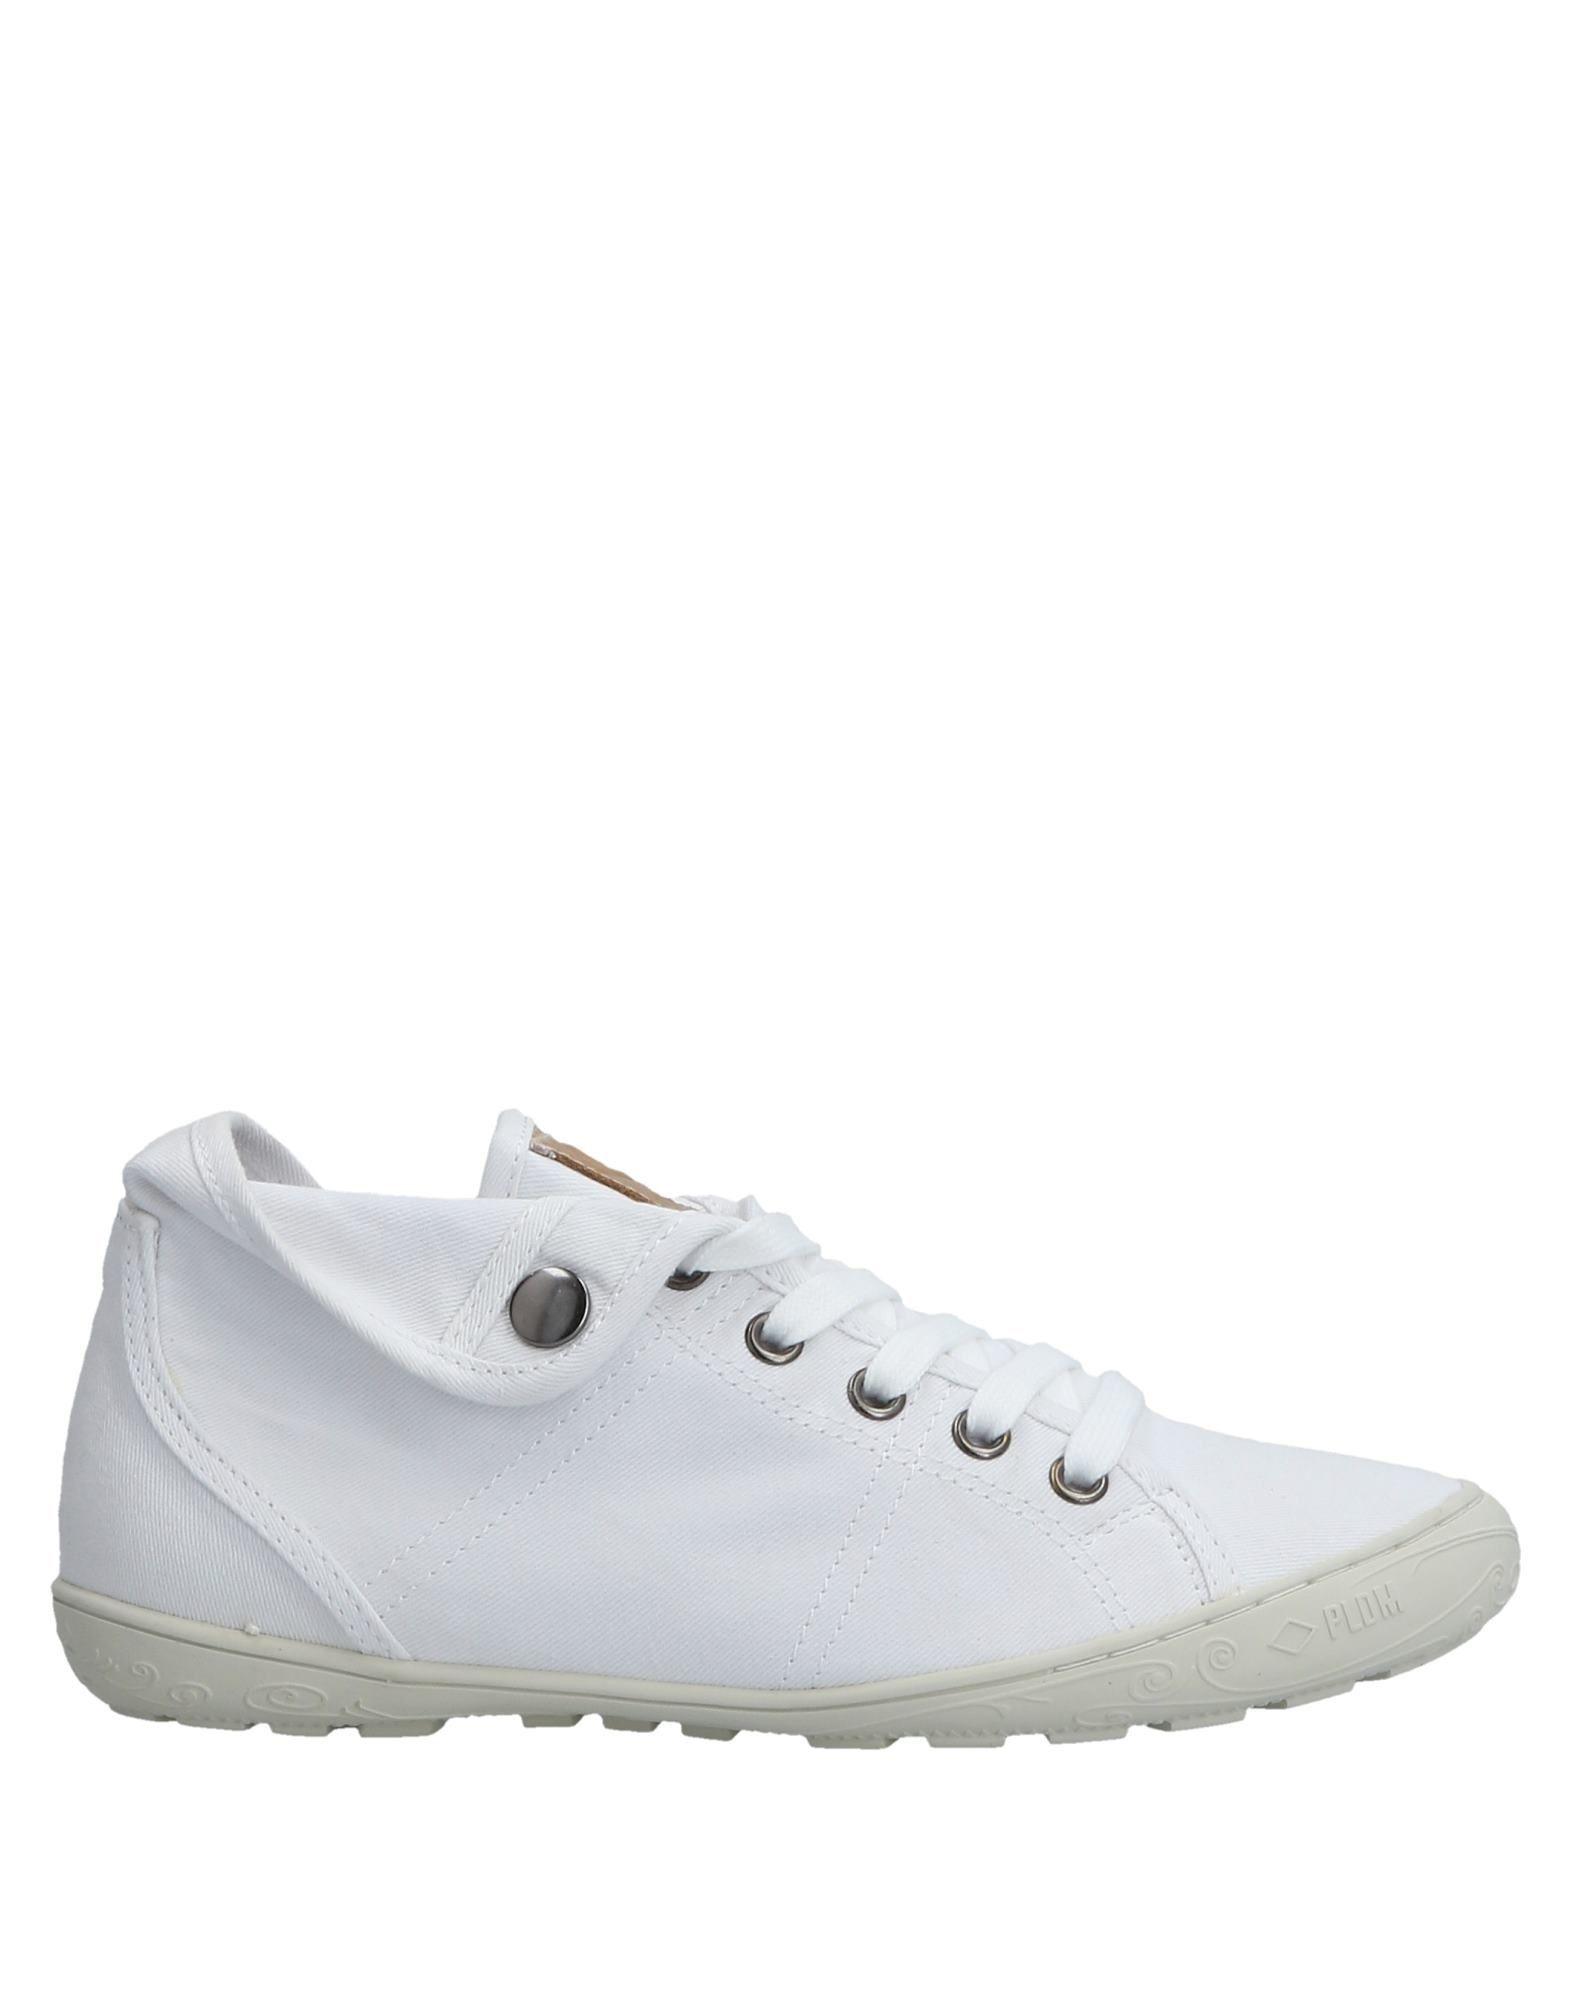 Pldm By Palladium White Sneakers